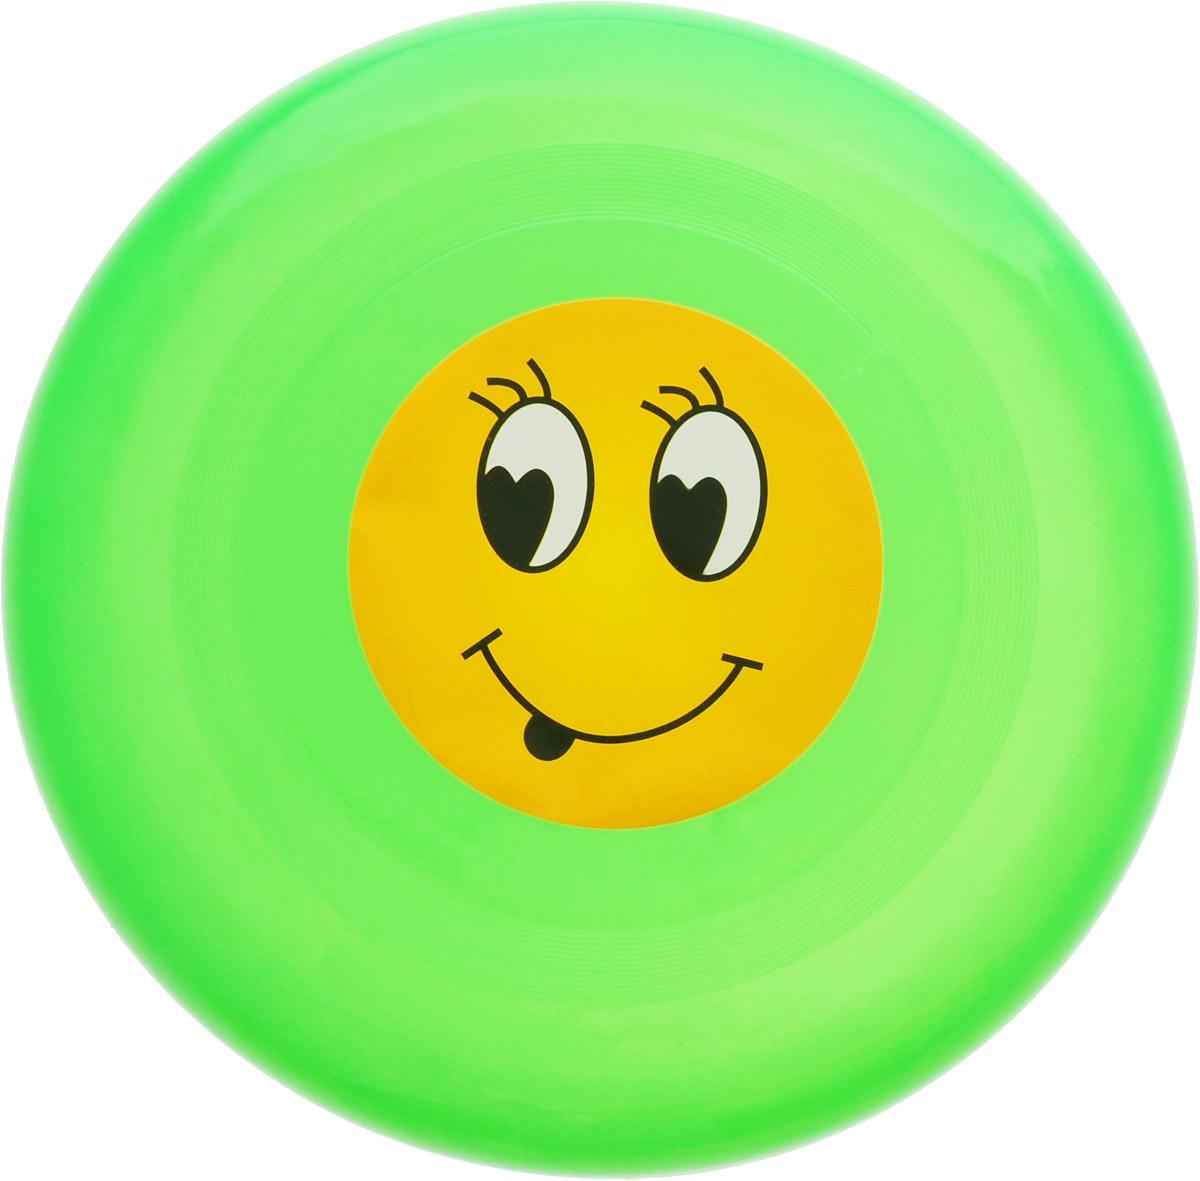 Veld-Co Летающая тарелка Смайл цвет зеленый диаметр 24 см